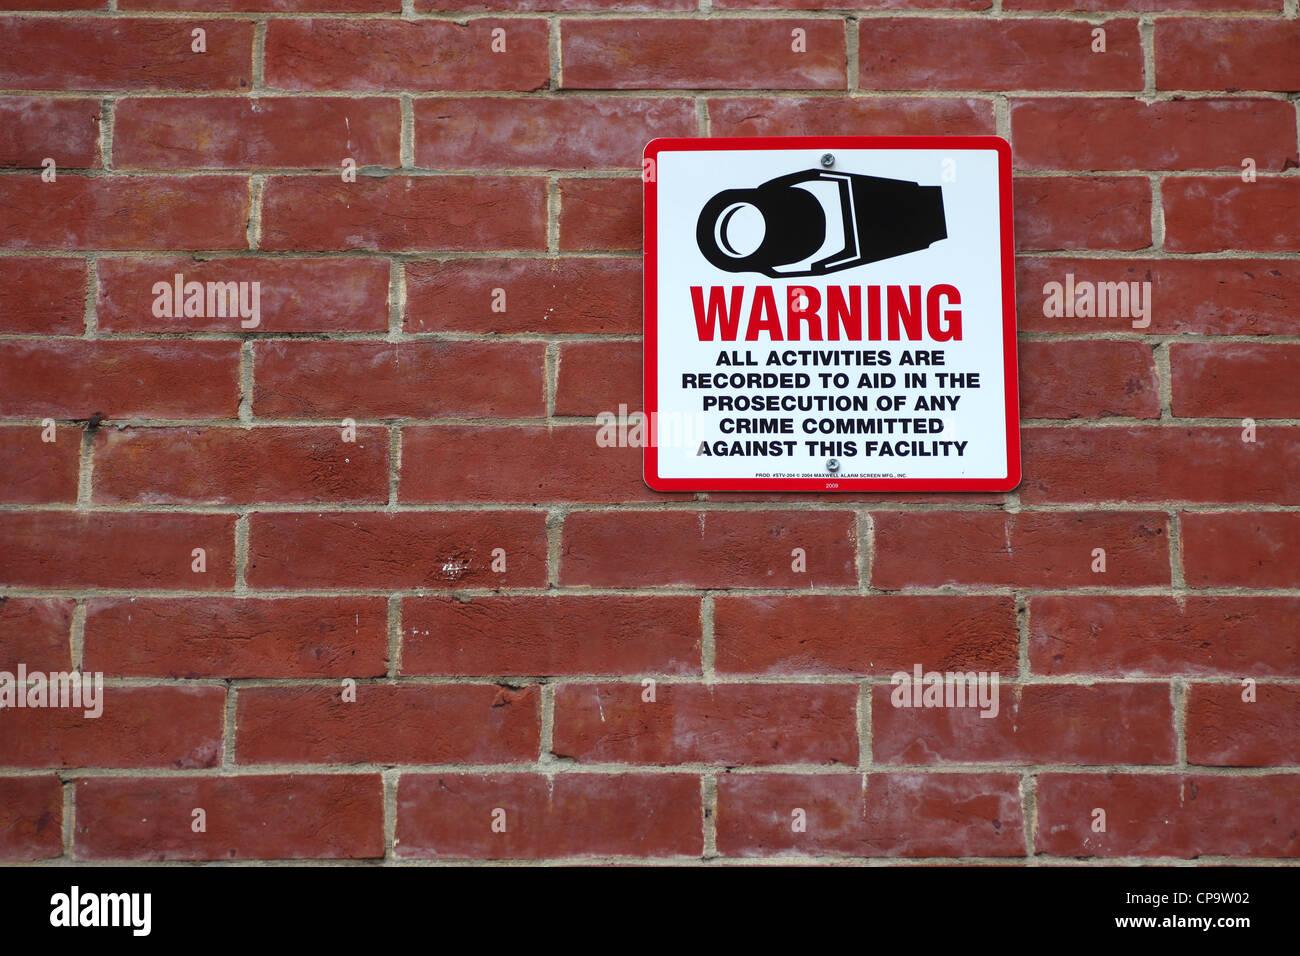 Surveillance warning sign on brick wall - Stock Image